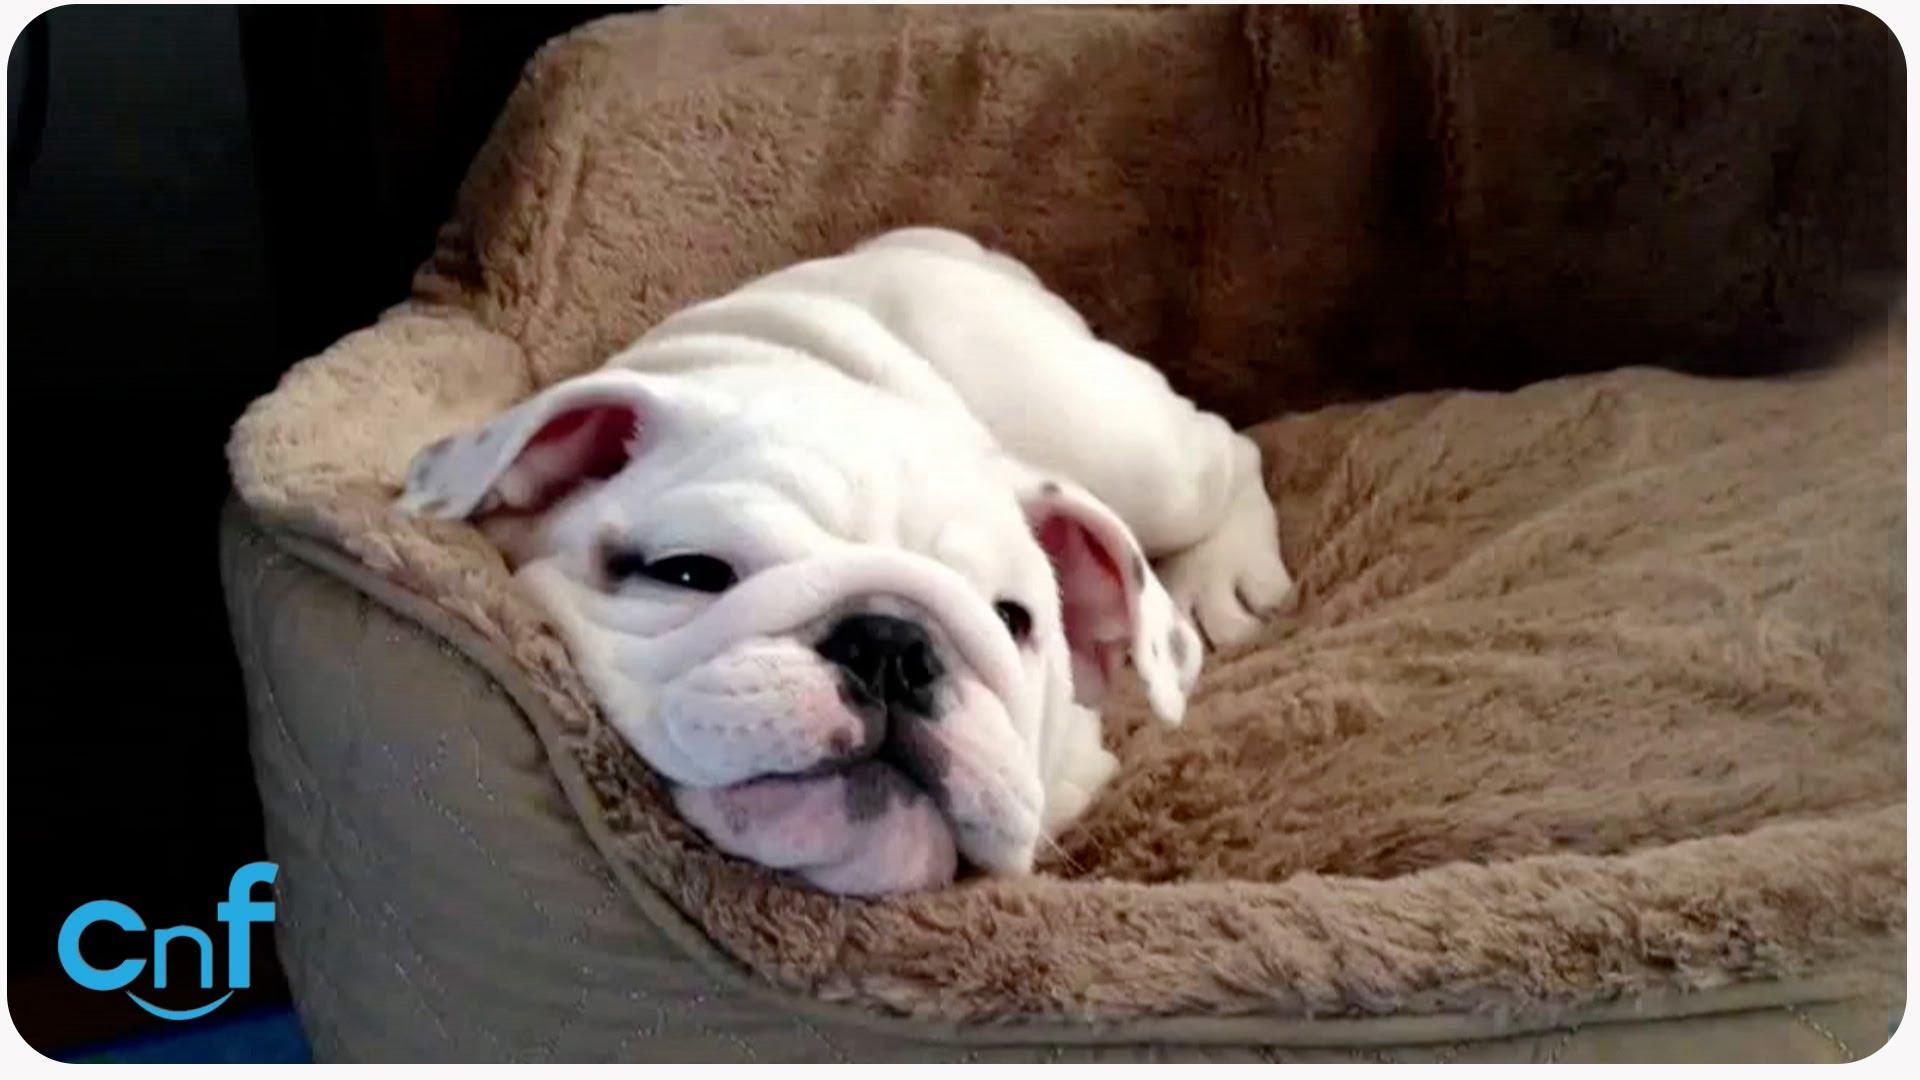 Sleeping English Bulldog Puppy Candy The English Bulldog Puppy